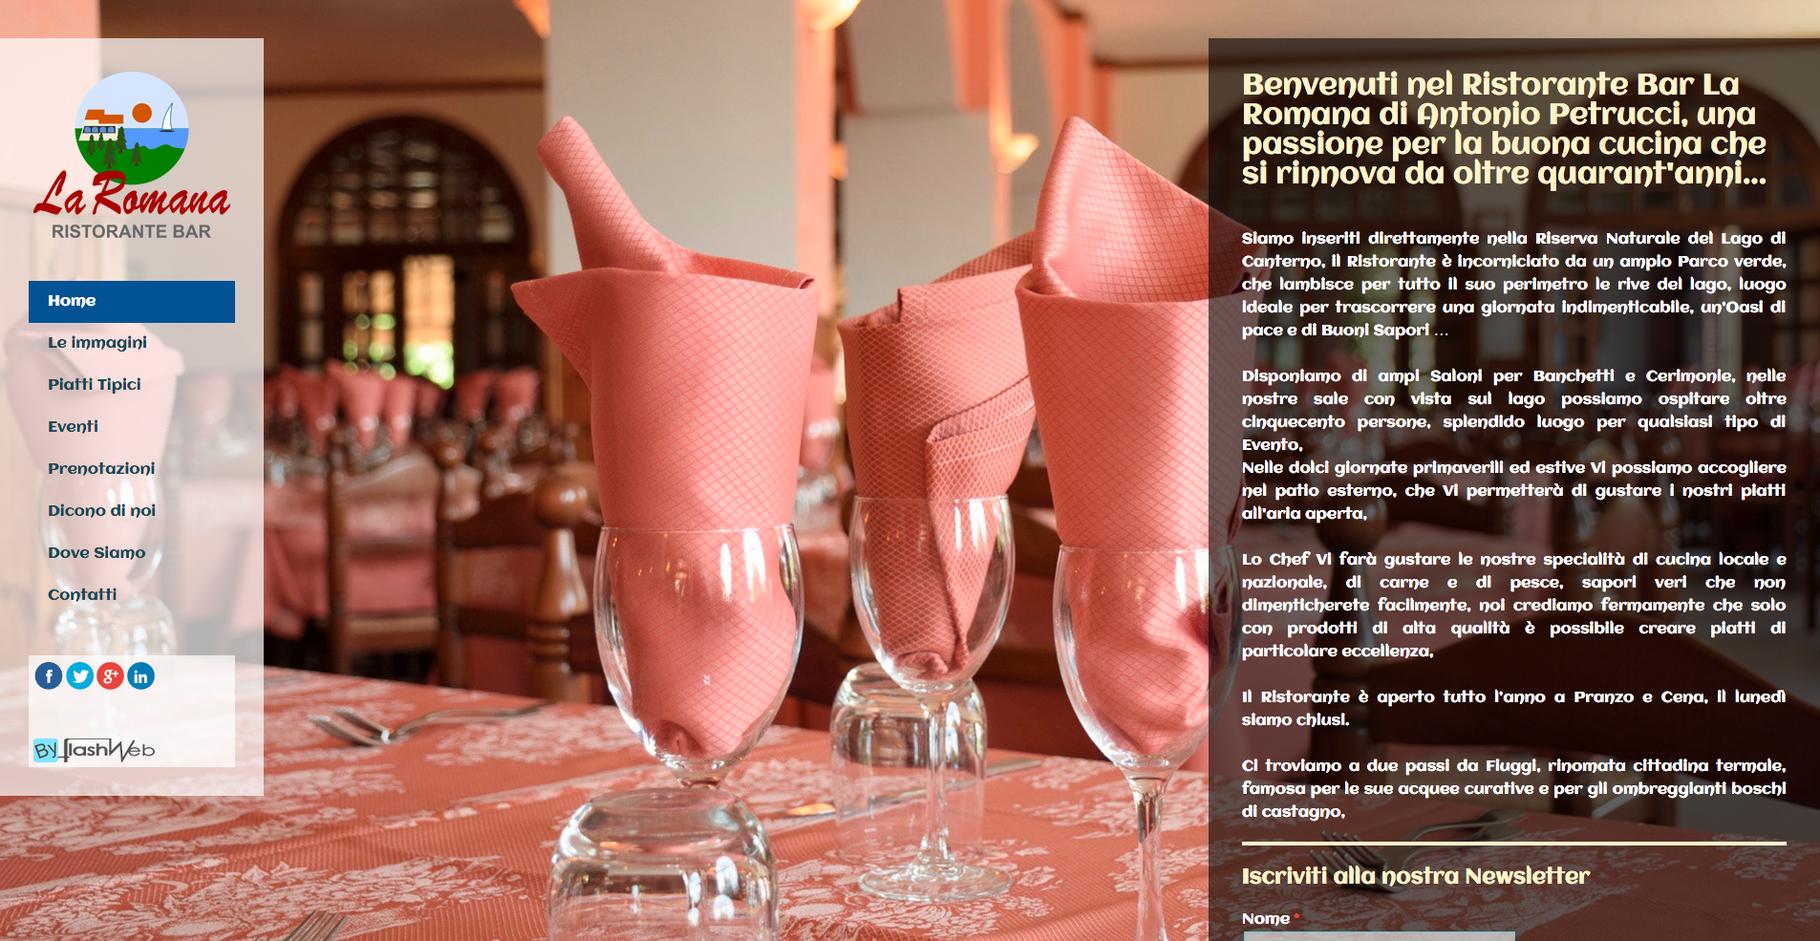 http://www.ristorantelaromana.it/